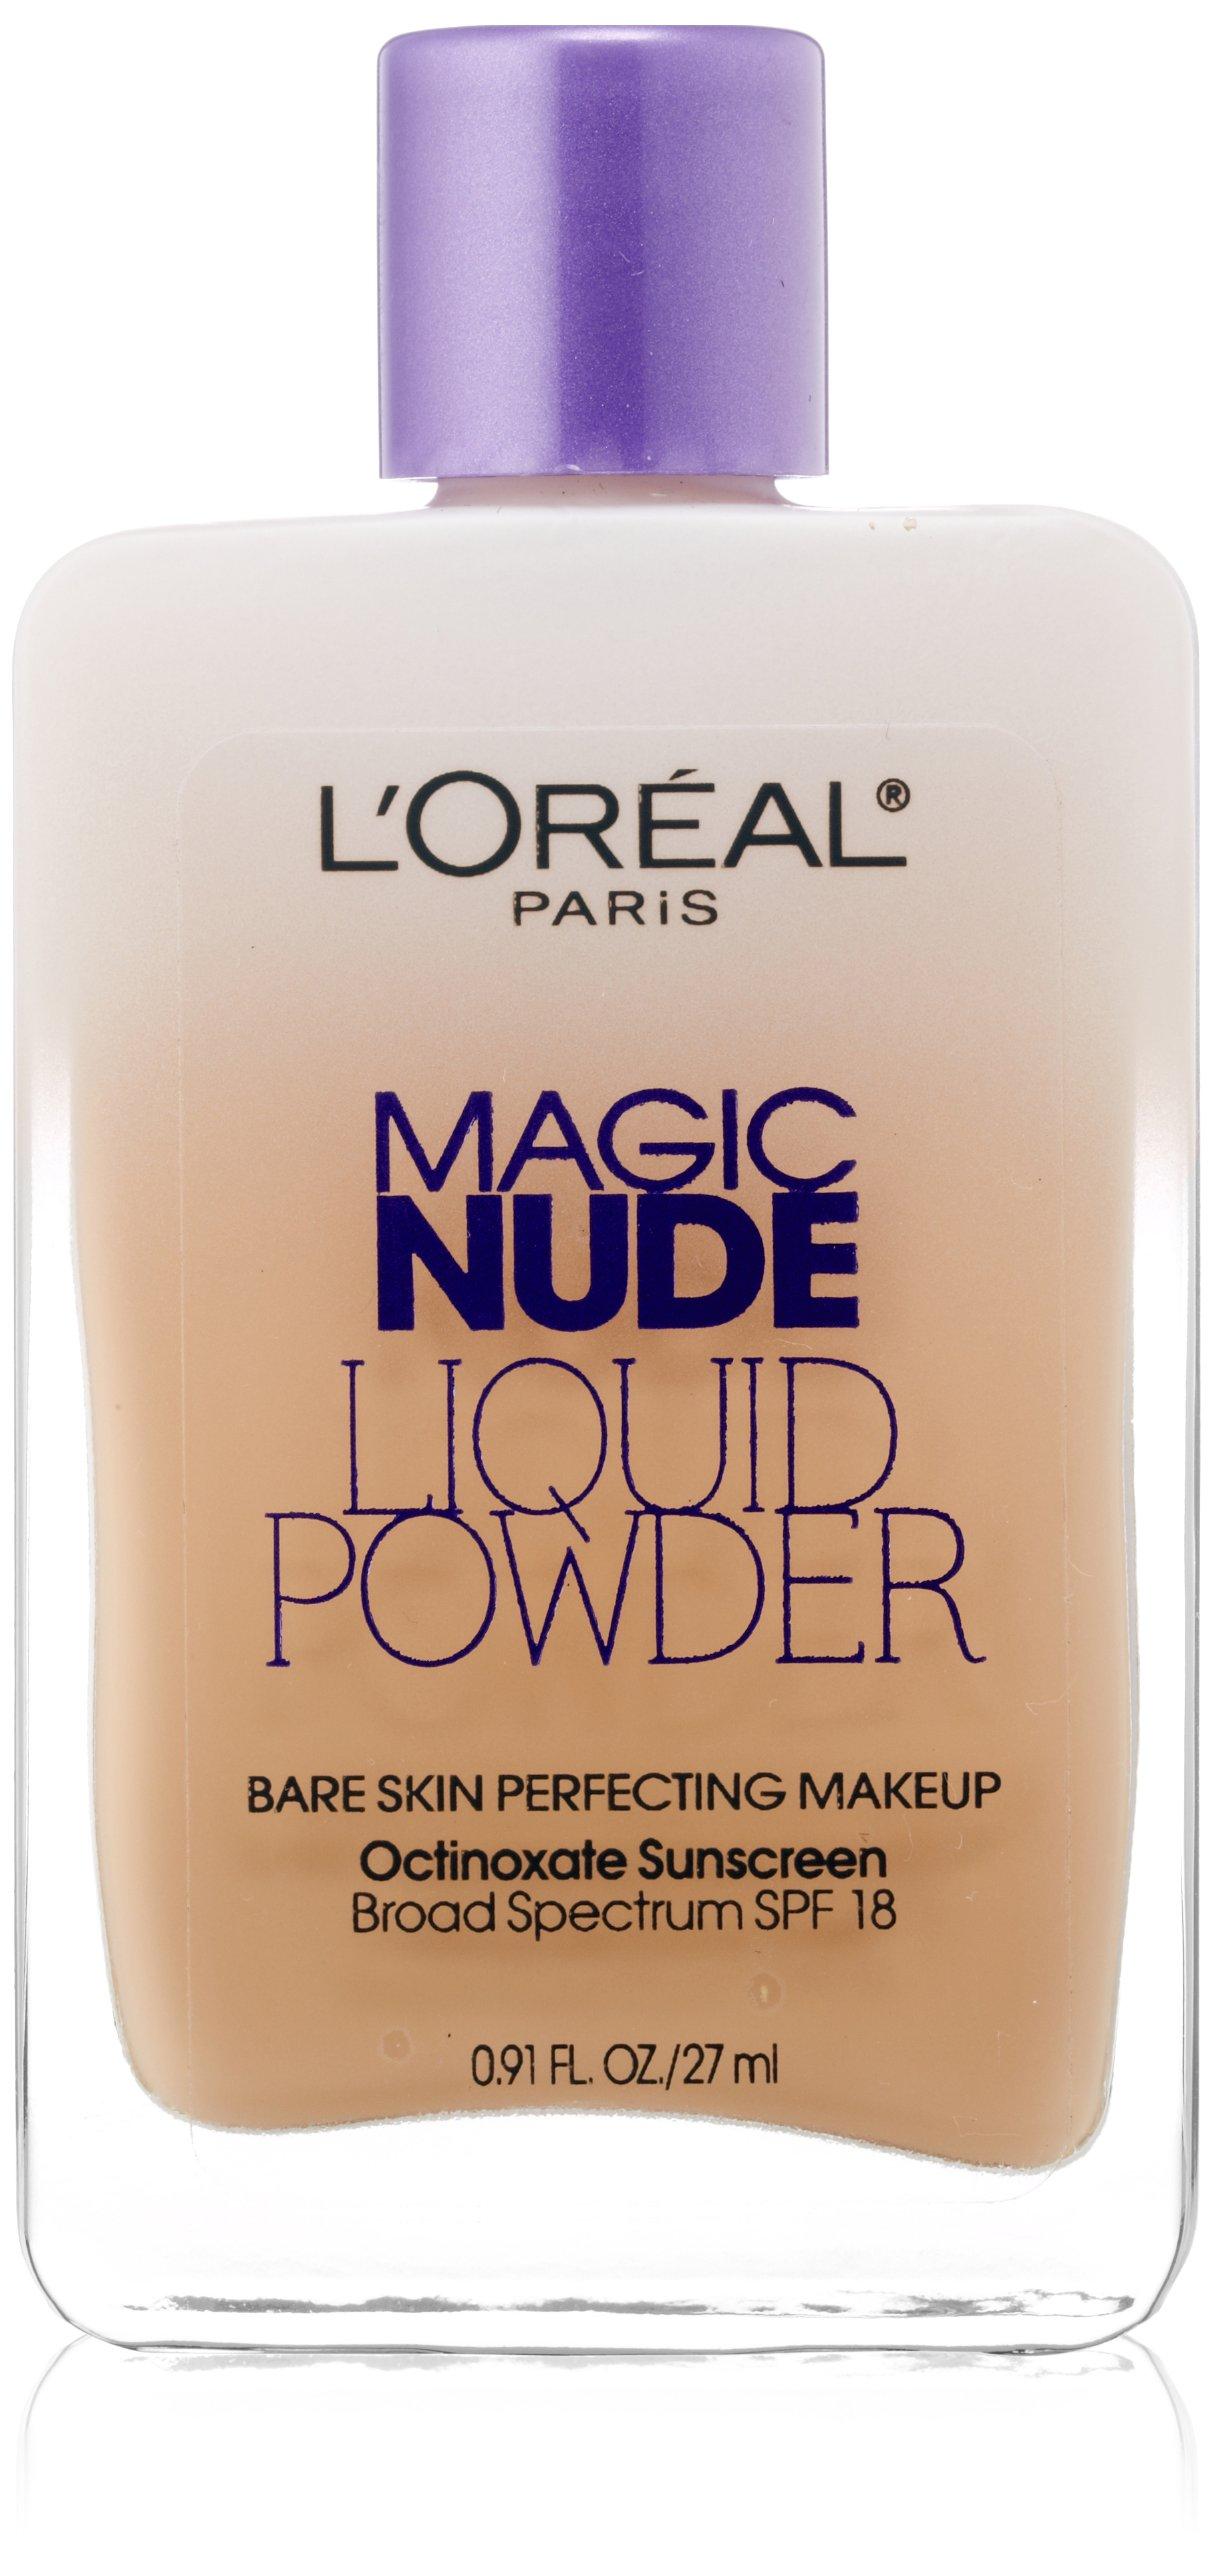 L'Oreal Paris Magic Nude Liquid Powder Bare Skin Perfecting Makeup SPF 18, Classic Ivory, 0.91 Ounces